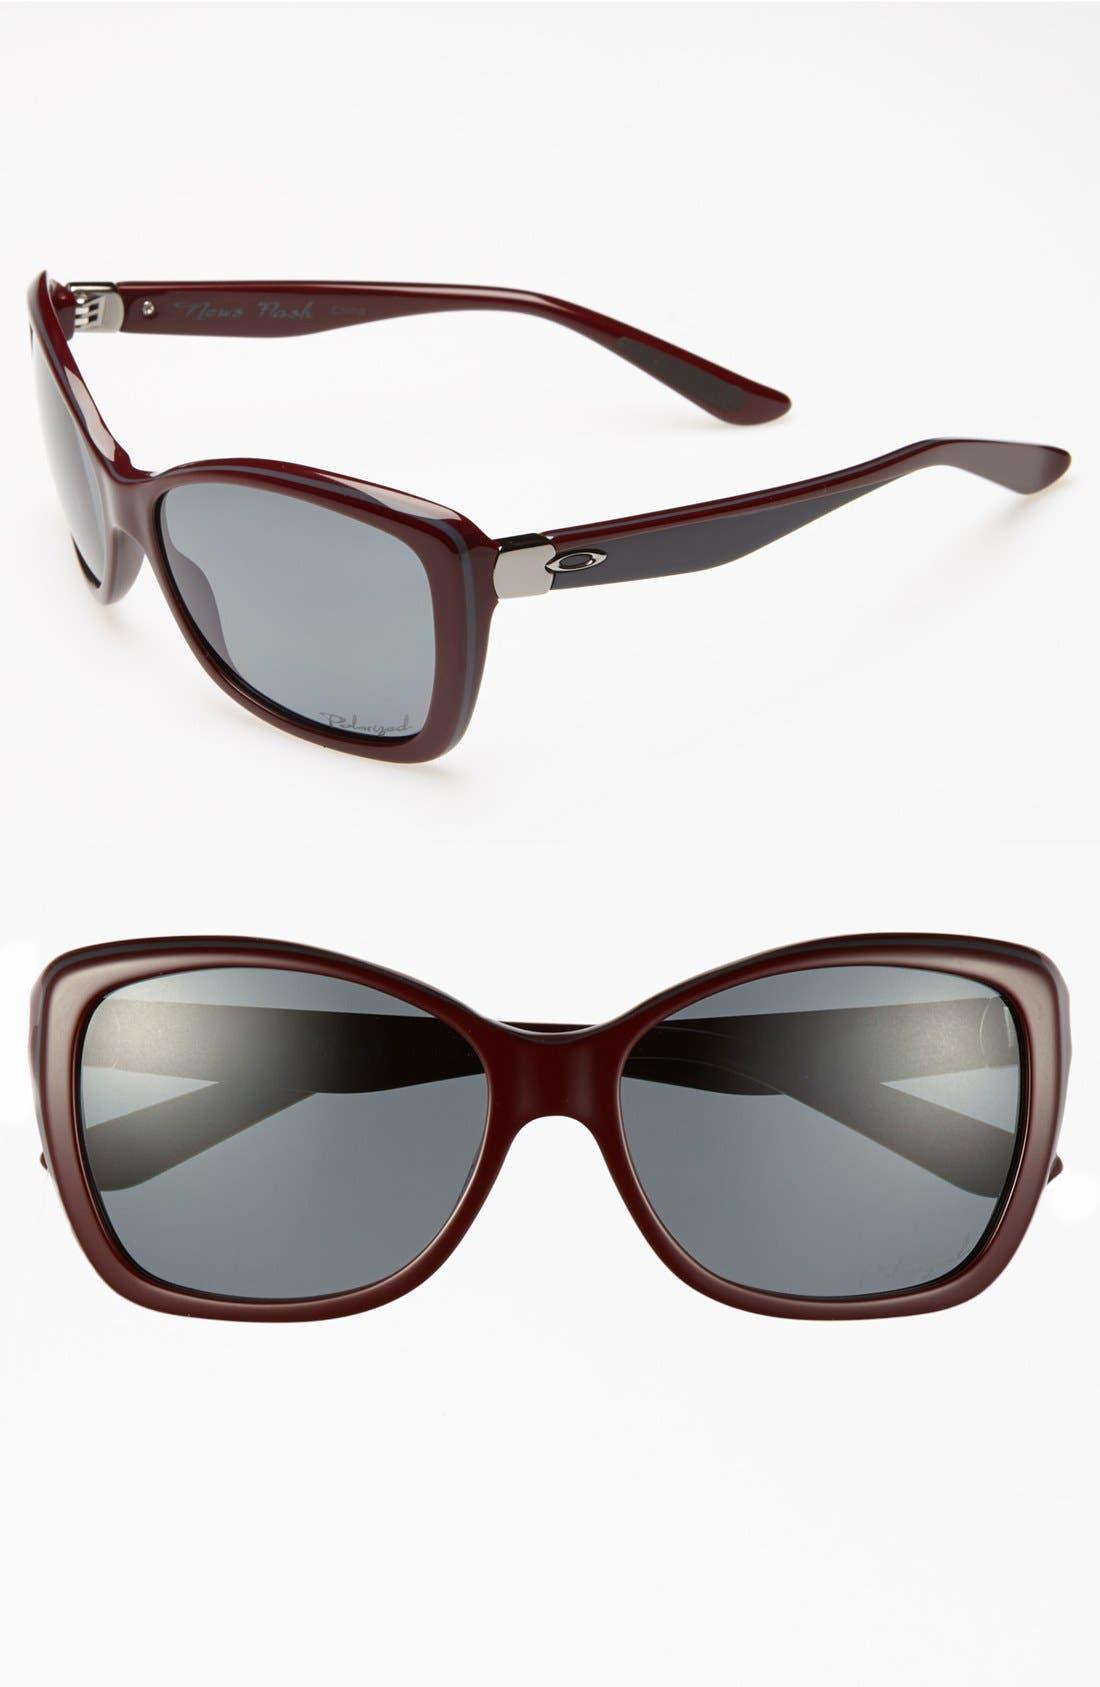 Alternate Image 1 Selected - Oakley 'News Flash' 56mm Polarized Sunglasses